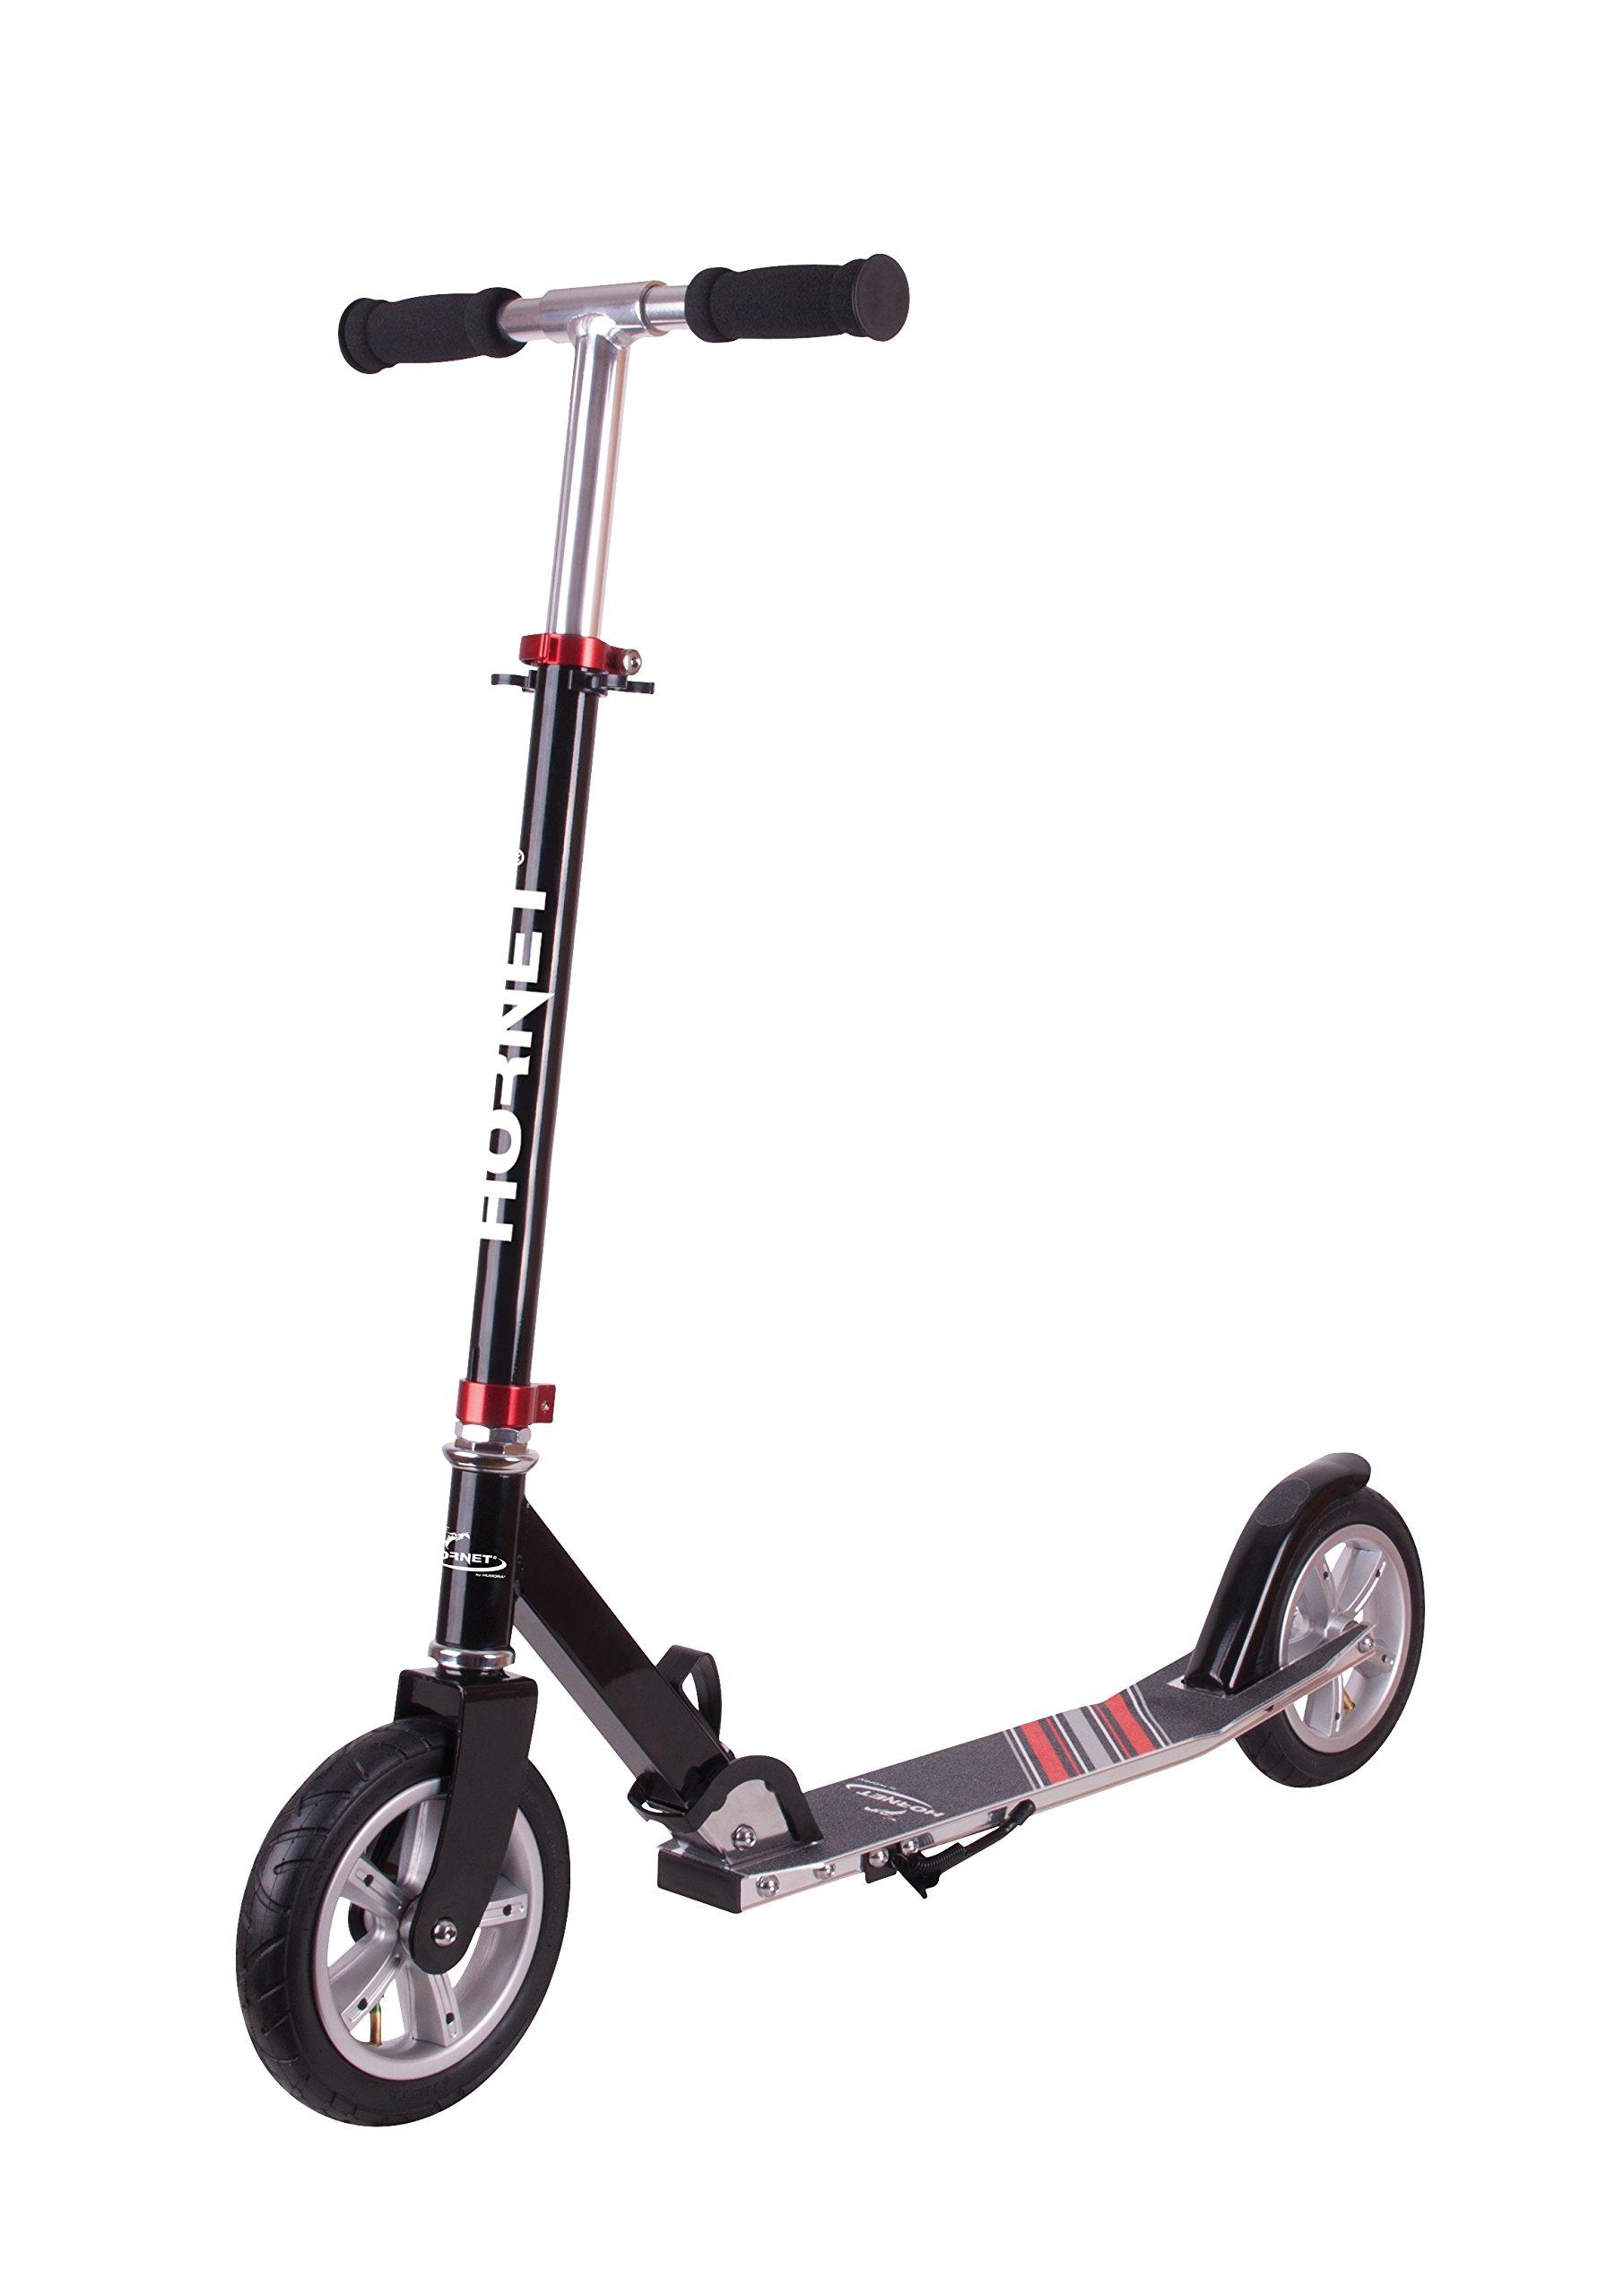 hornet scooter roller air 200 schwarz rot luftreifen. Black Bedroom Furniture Sets. Home Design Ideas